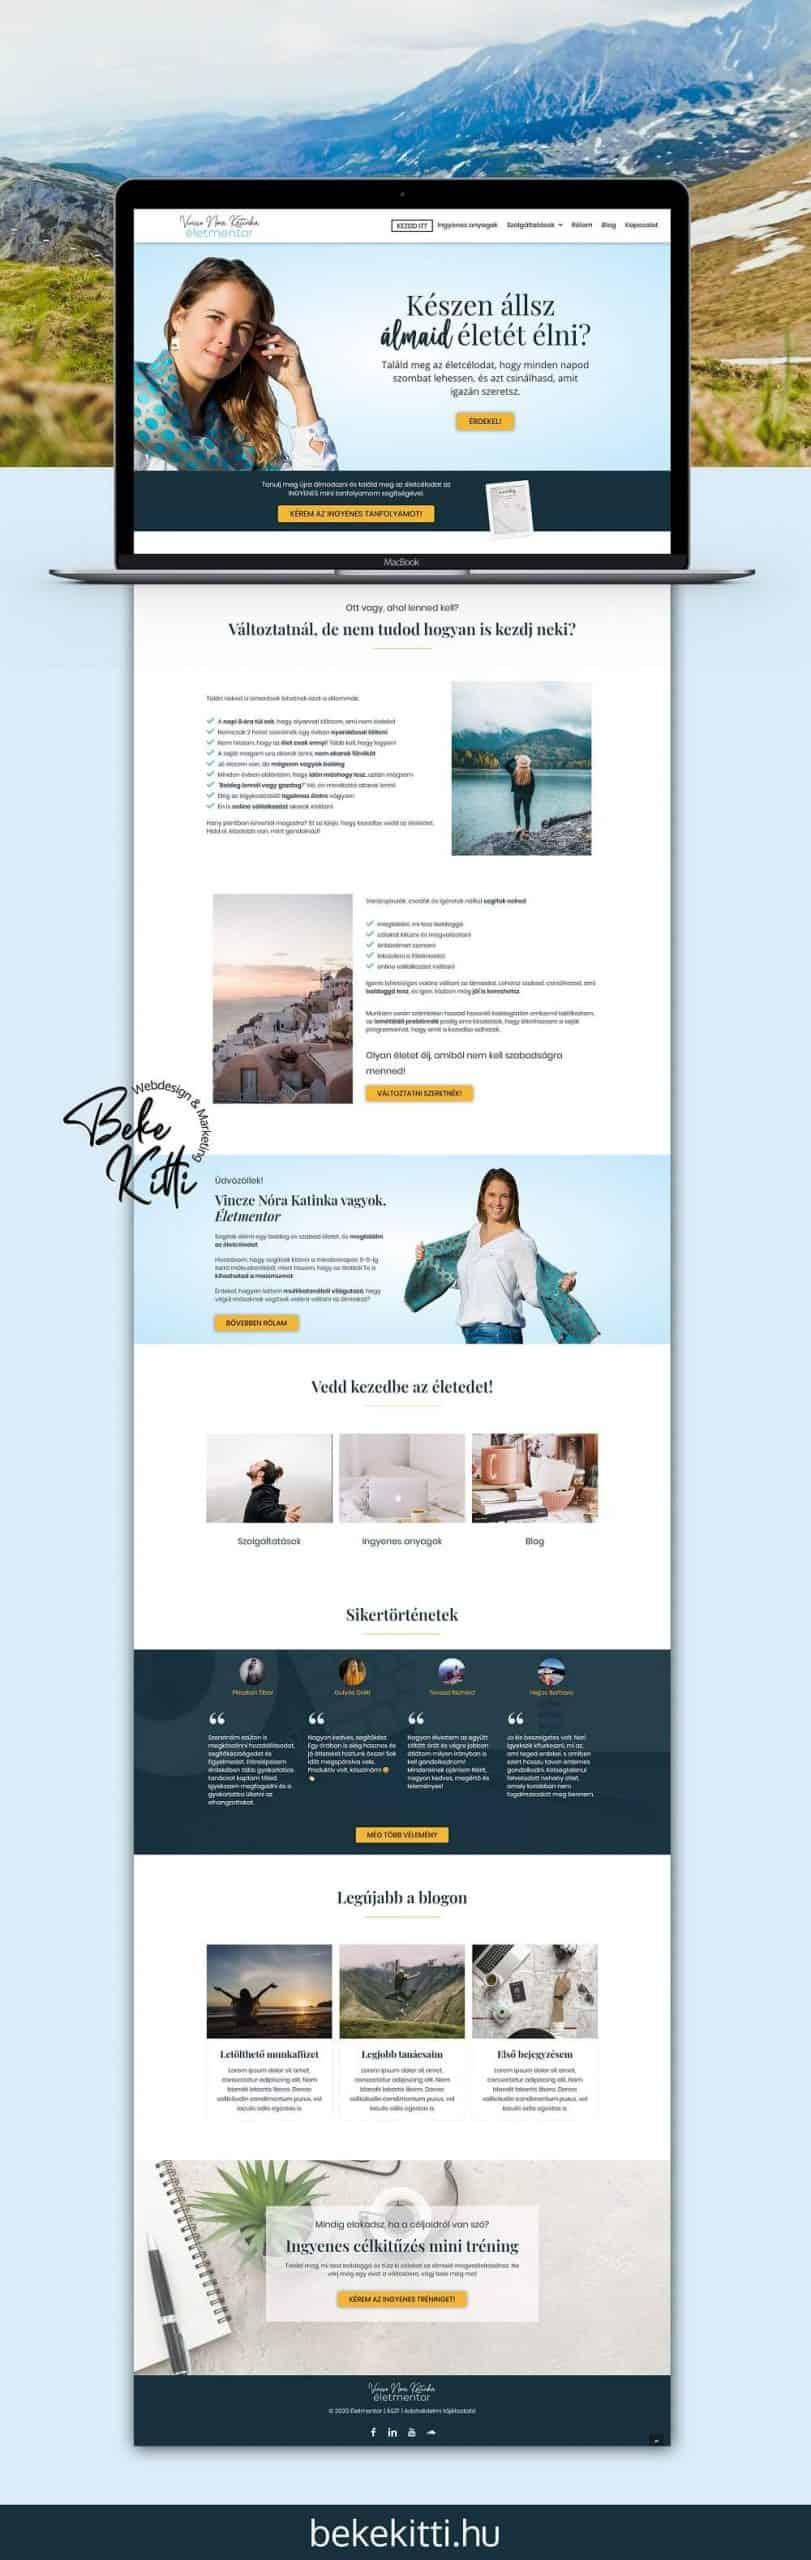 Beke Kitti Weboldal Referencia Eletmentor